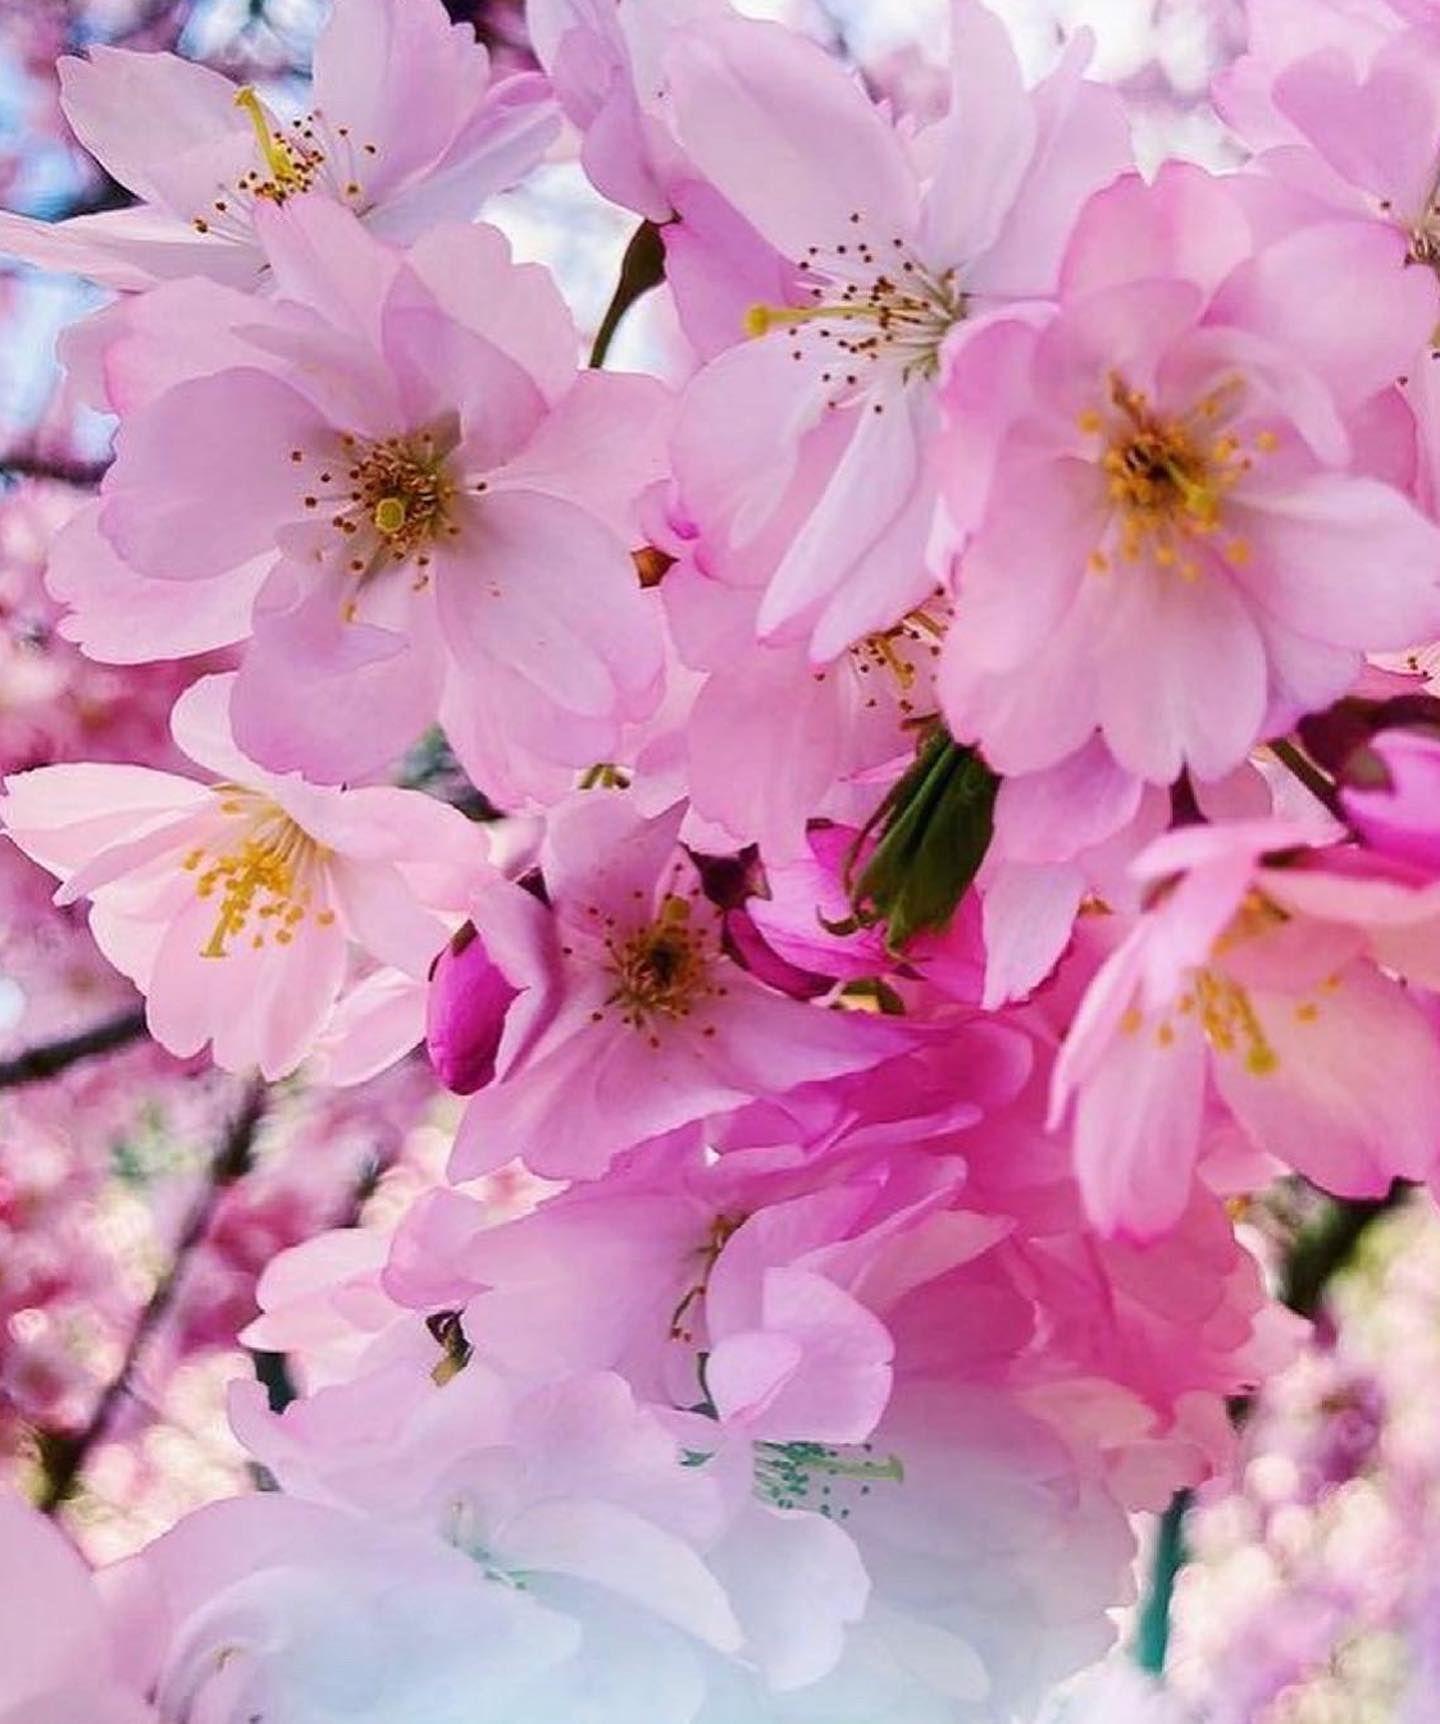 1624638378_721_Flower-Power